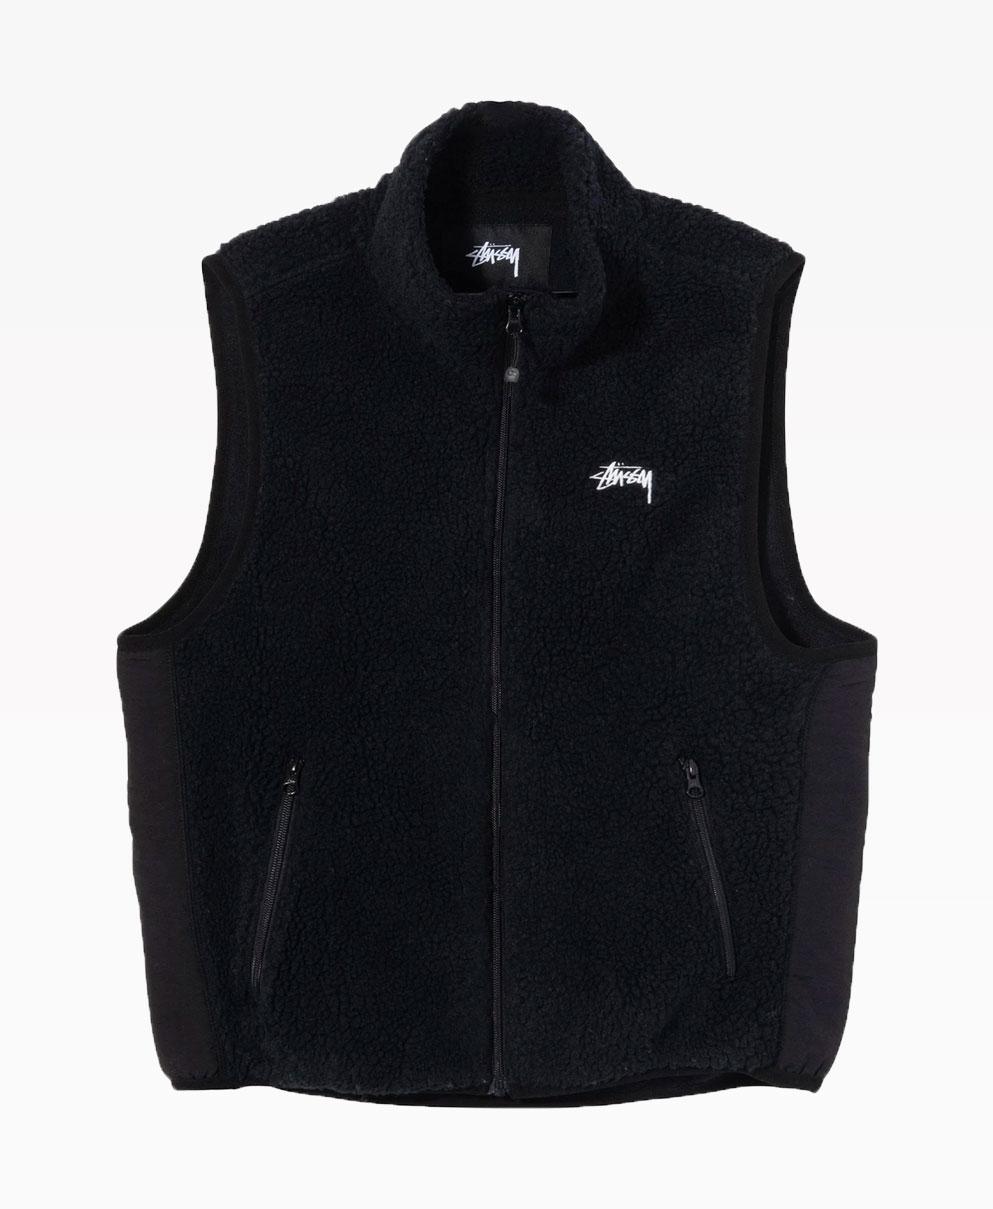 Stussy Block Sherpa Vest Black Front